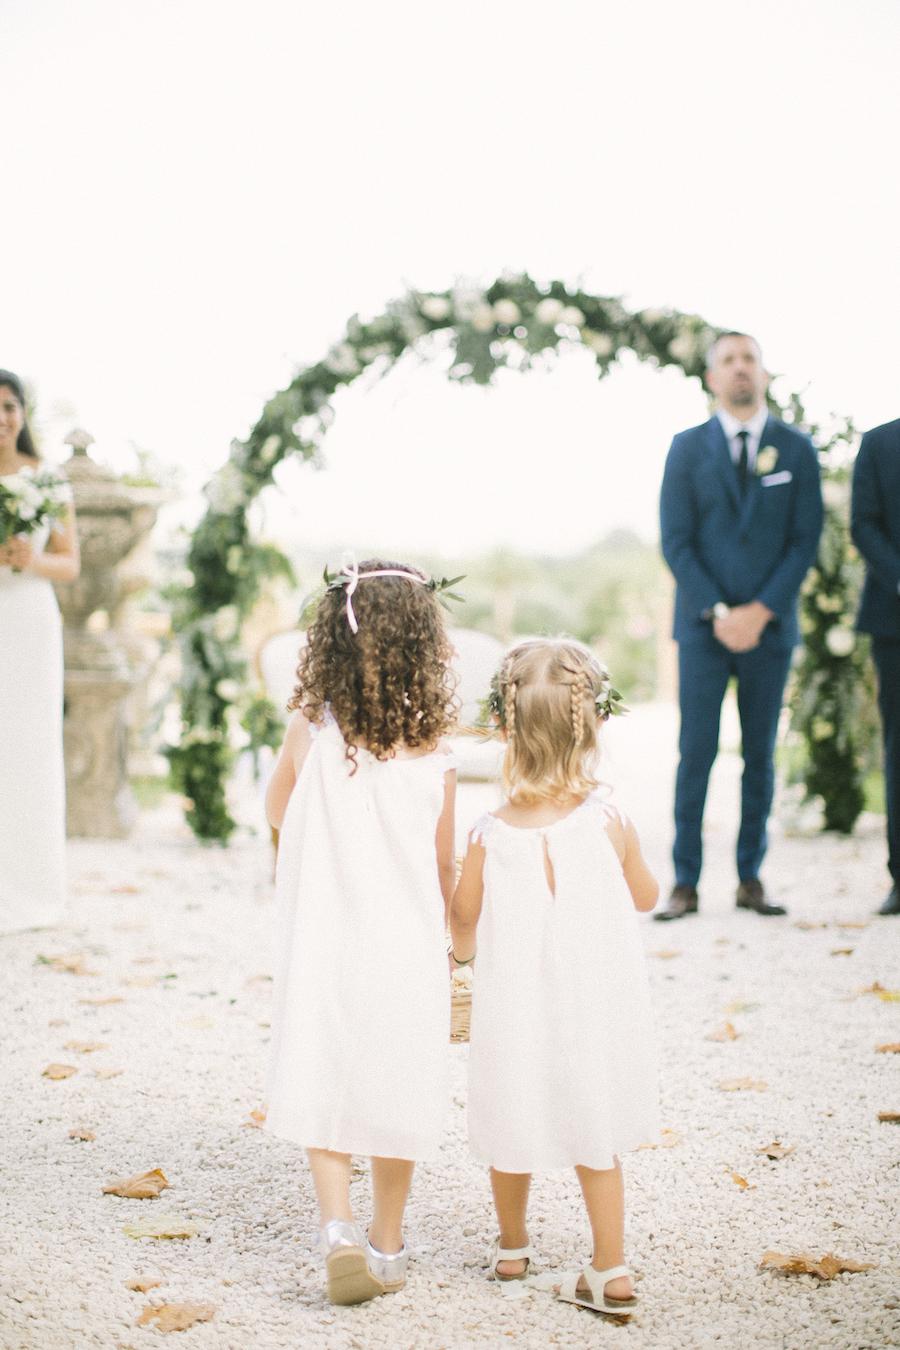 saya-photography-wedding-photographer-provence-chateau-de-robernier-53.jpg